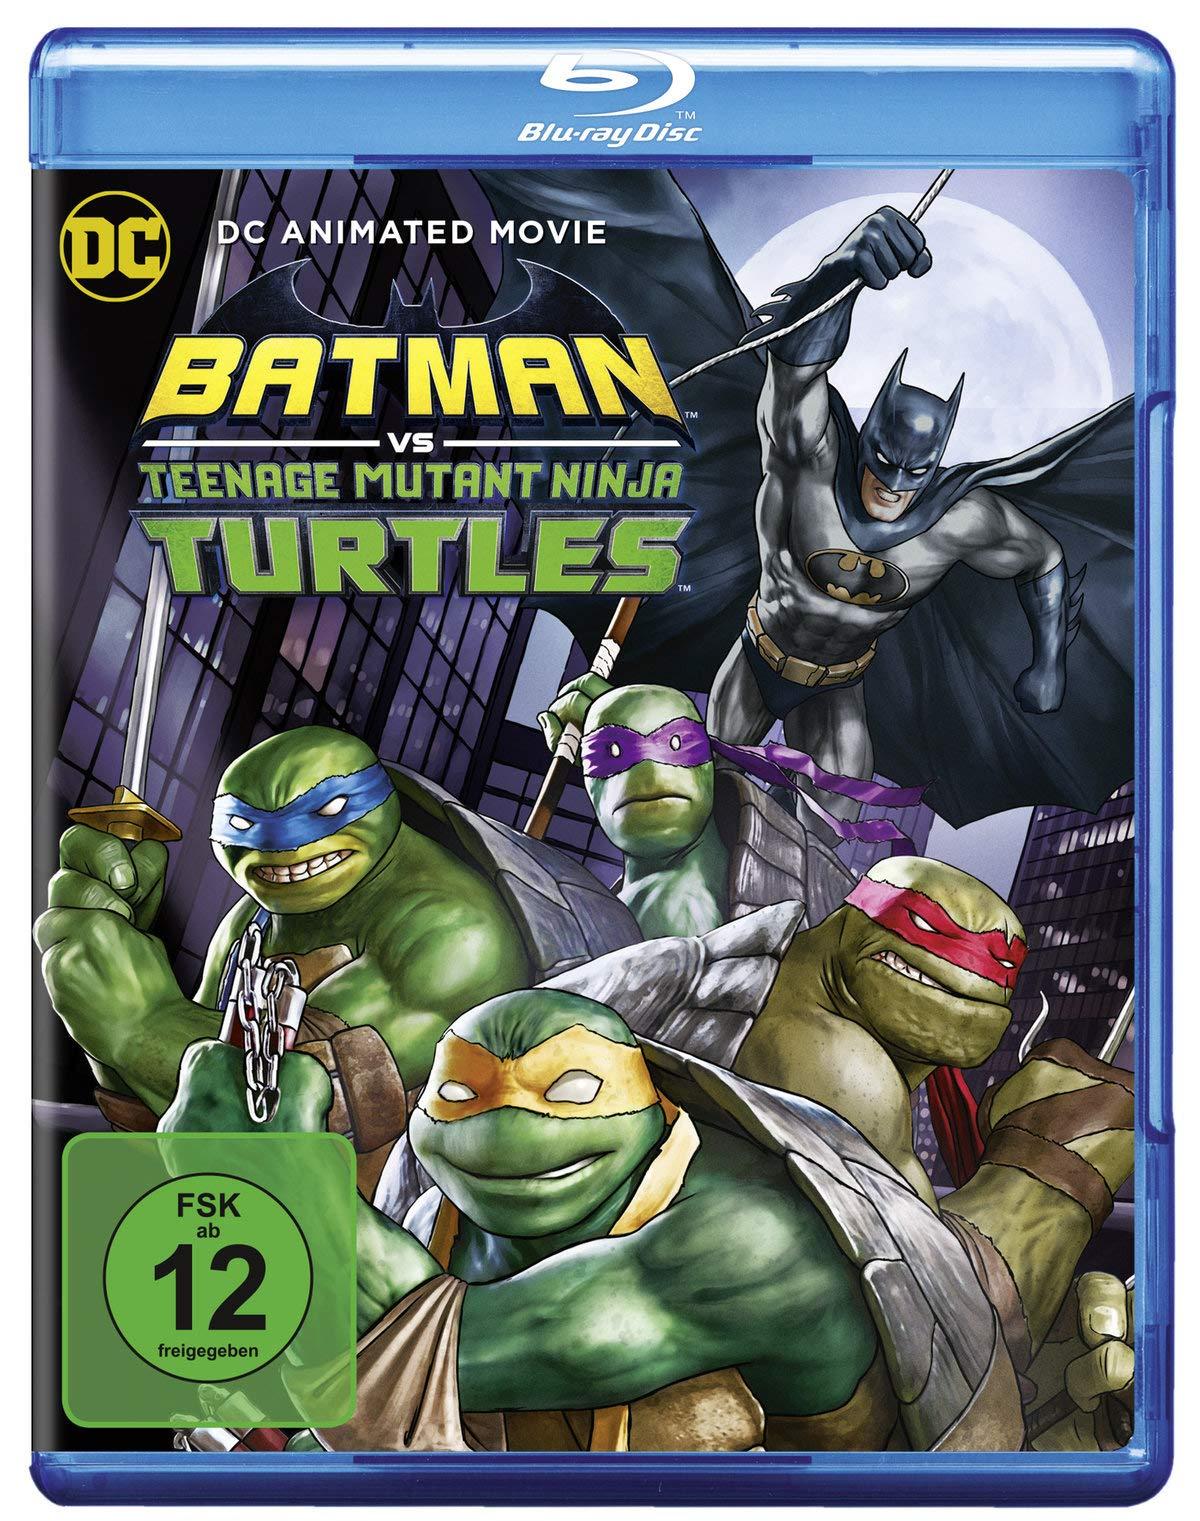 Batman vs. Teenage Mutant Ninja Turtles: Amazon.es: Marly ...